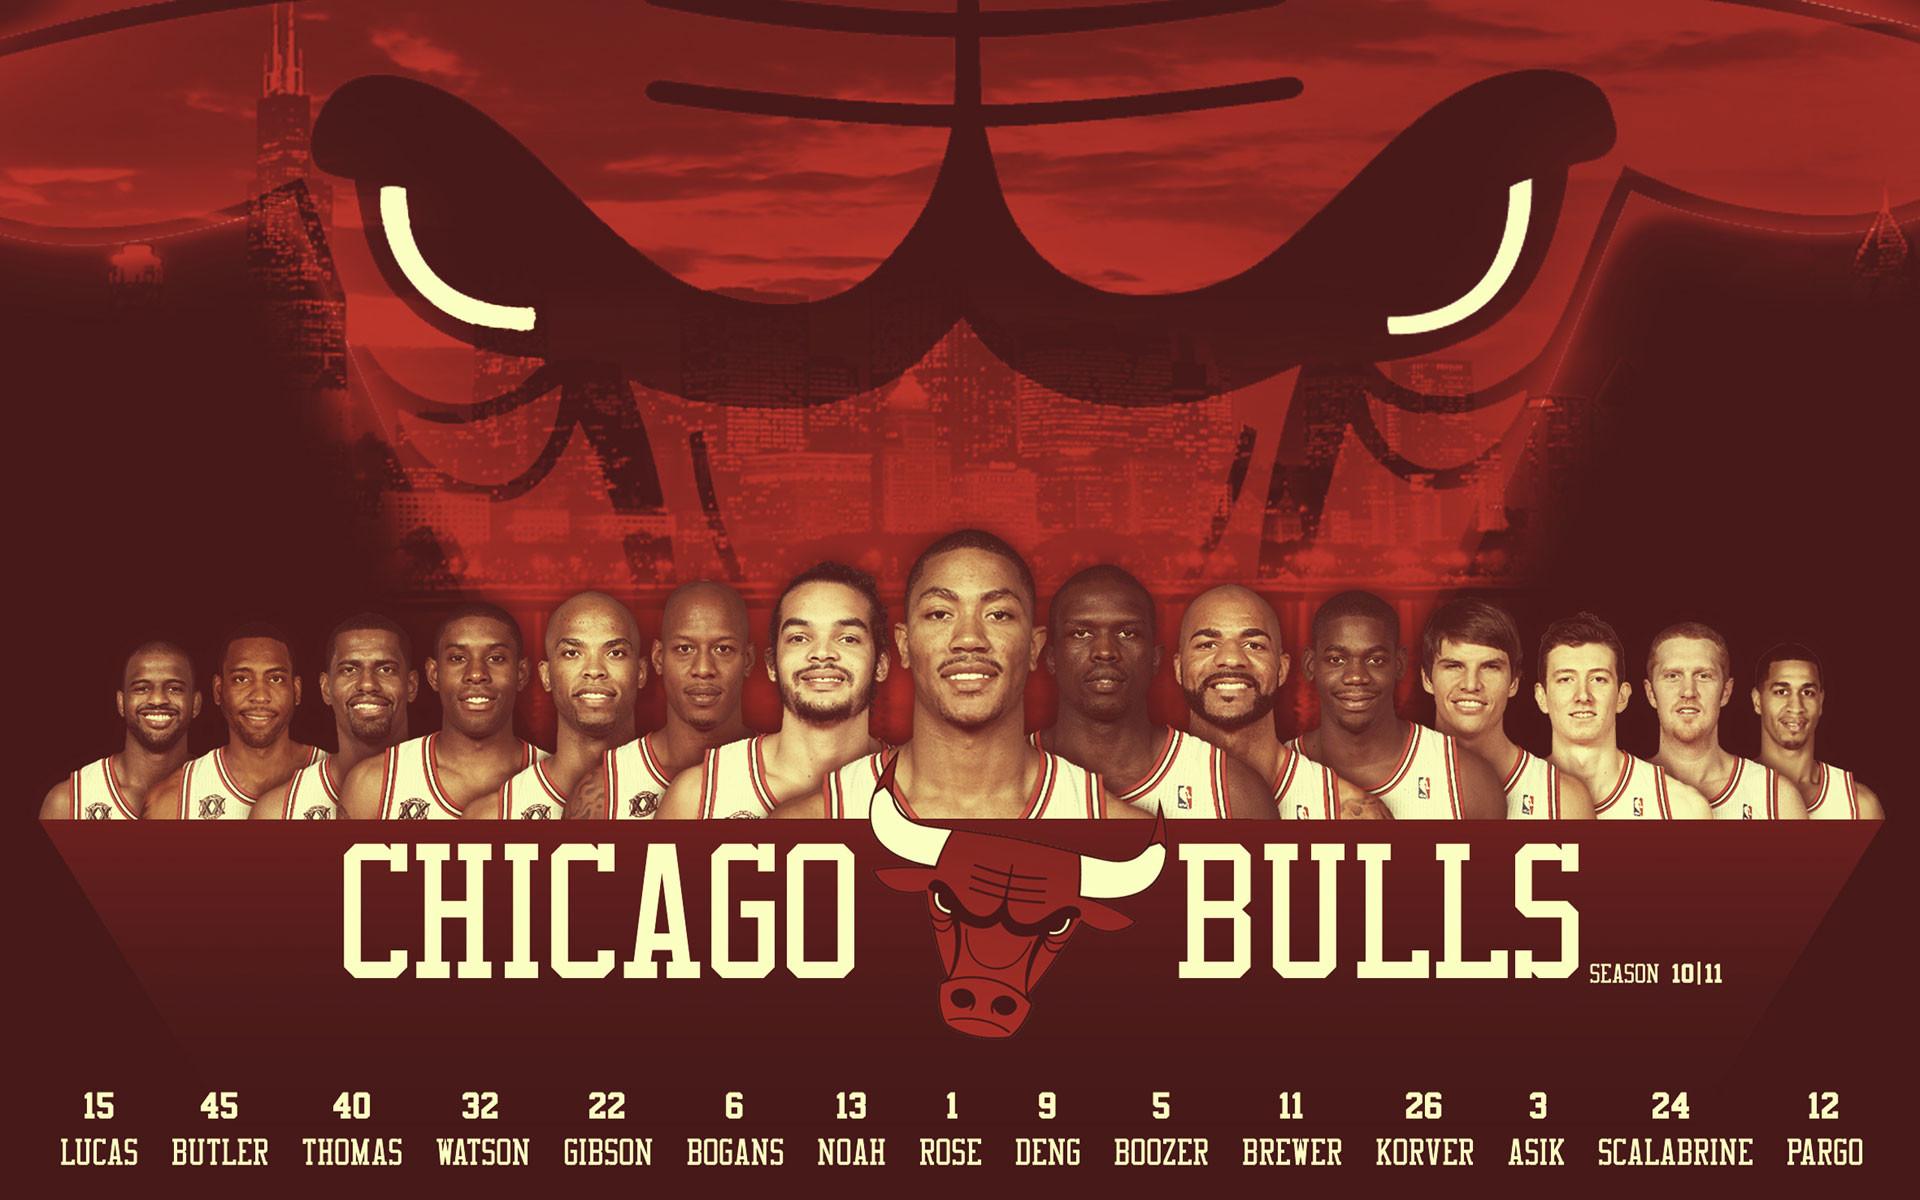 tags chicago bulls basketball full hd bulls team chicago date 14 09 07 .